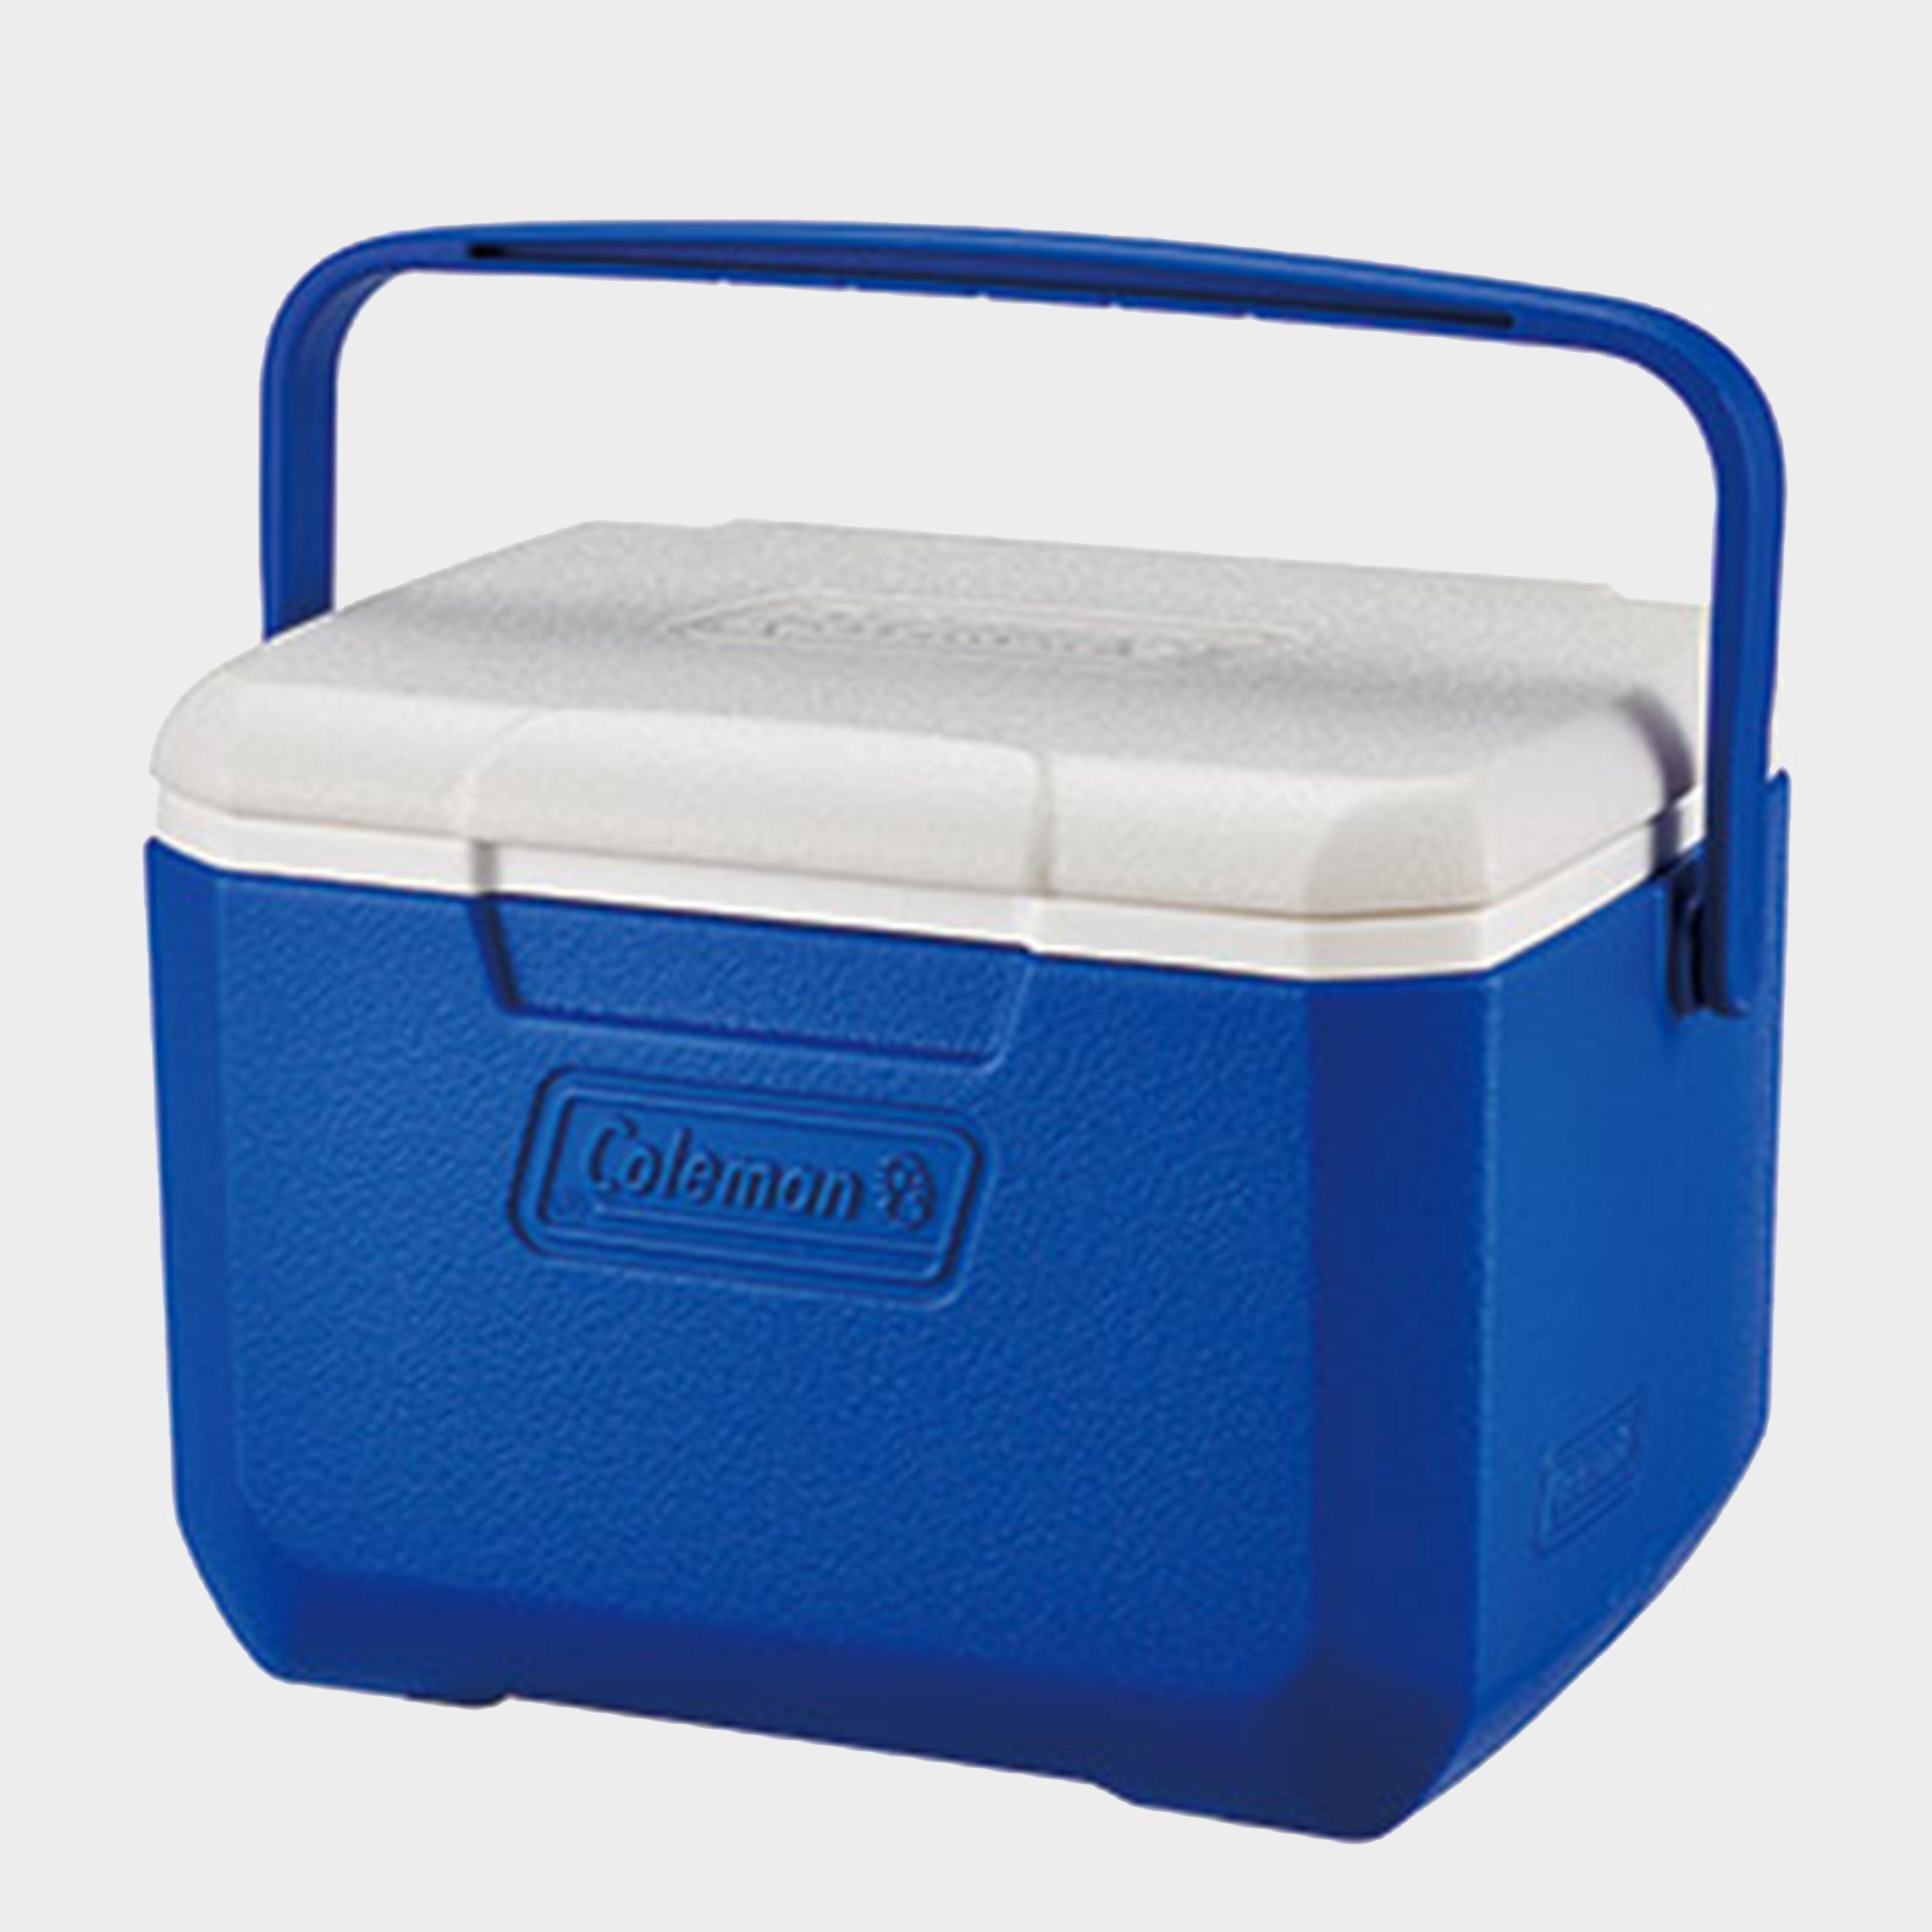 Coleman 50 Quart Xtreme Wheeled Cooler